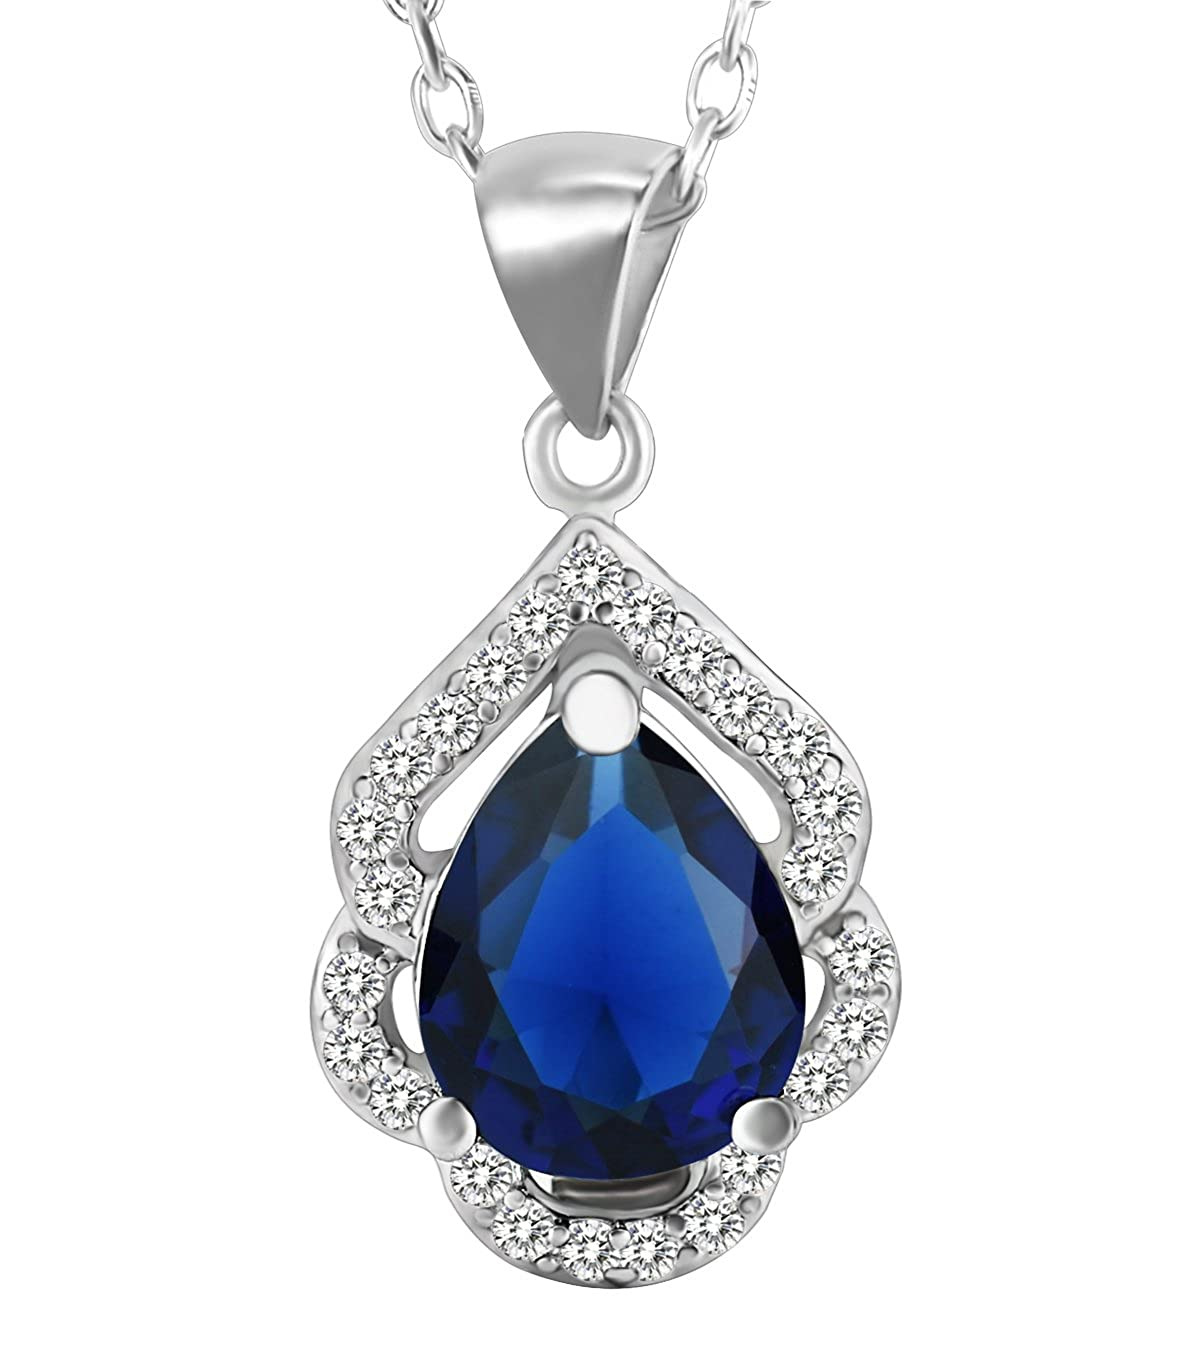 Elensan 925 Sterling Silver Emerald or Sapphire Birthstone Crystal Teardrop Pendant Necklace for Women